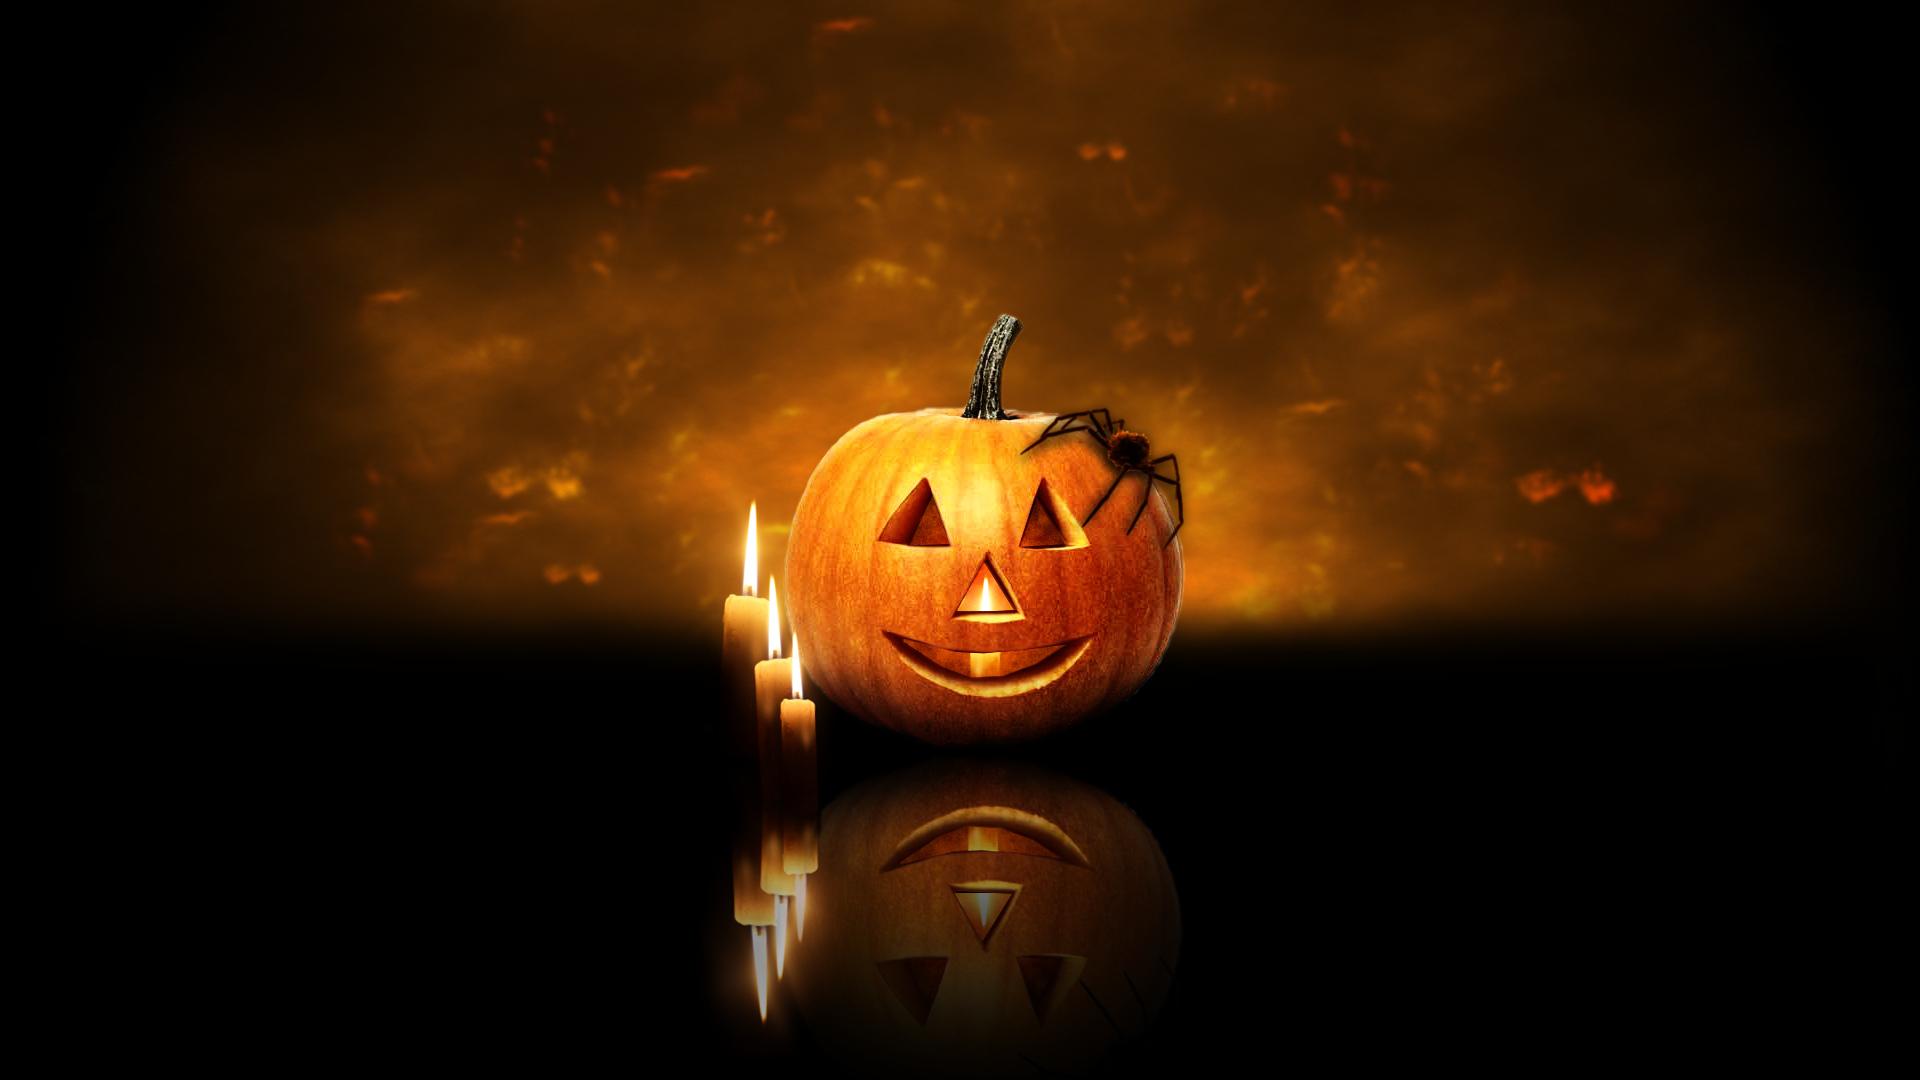 Desktop Halloween Scary Wallpaper - WallpaperSafari